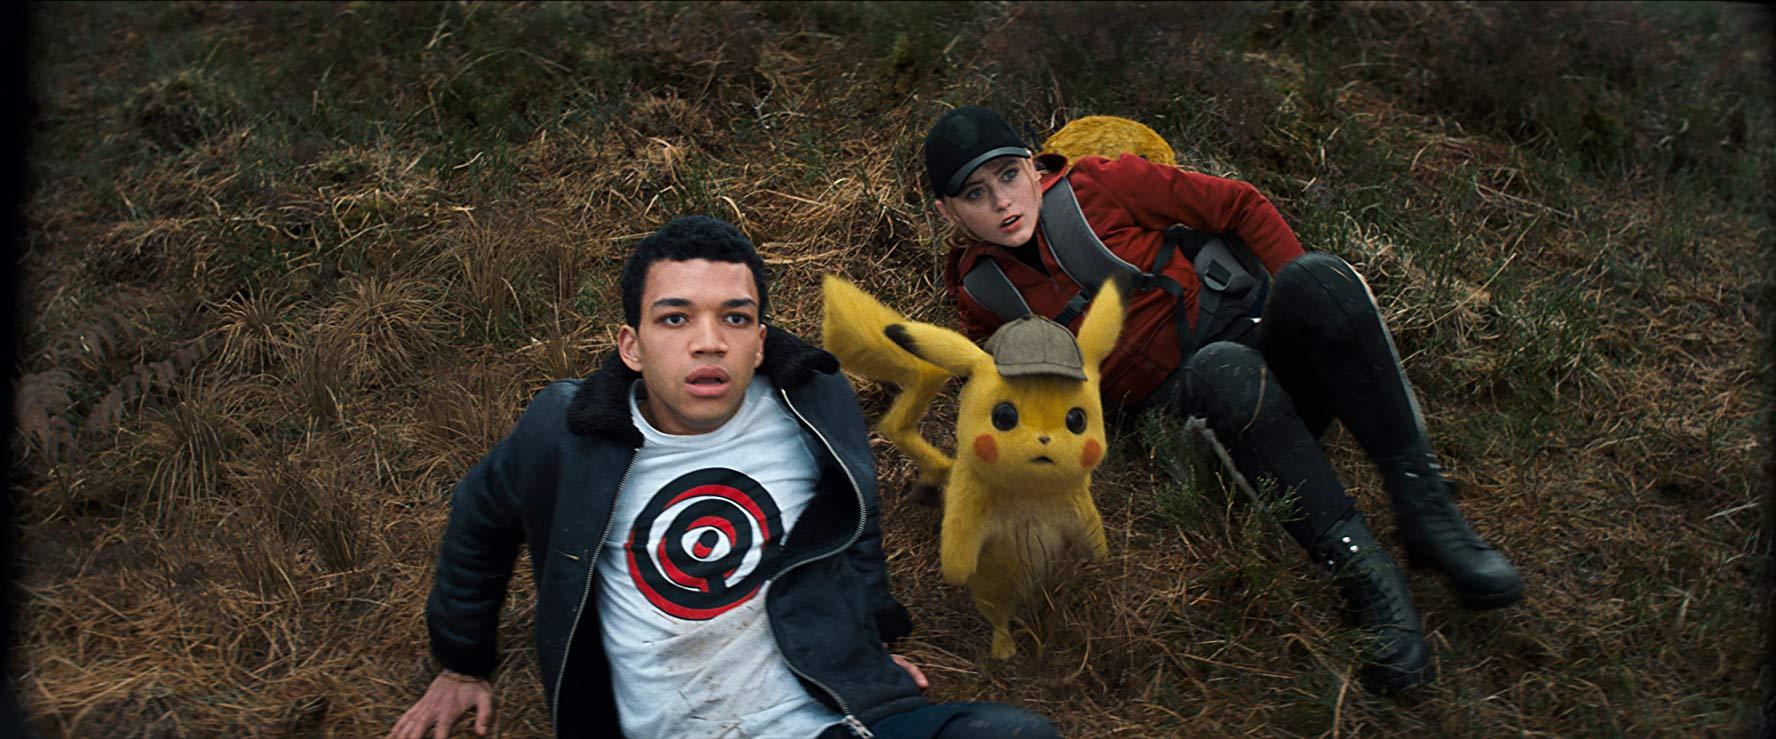 Reseña de la película Detective Pikachu - Pokémon: Detective Pikachu (2019)